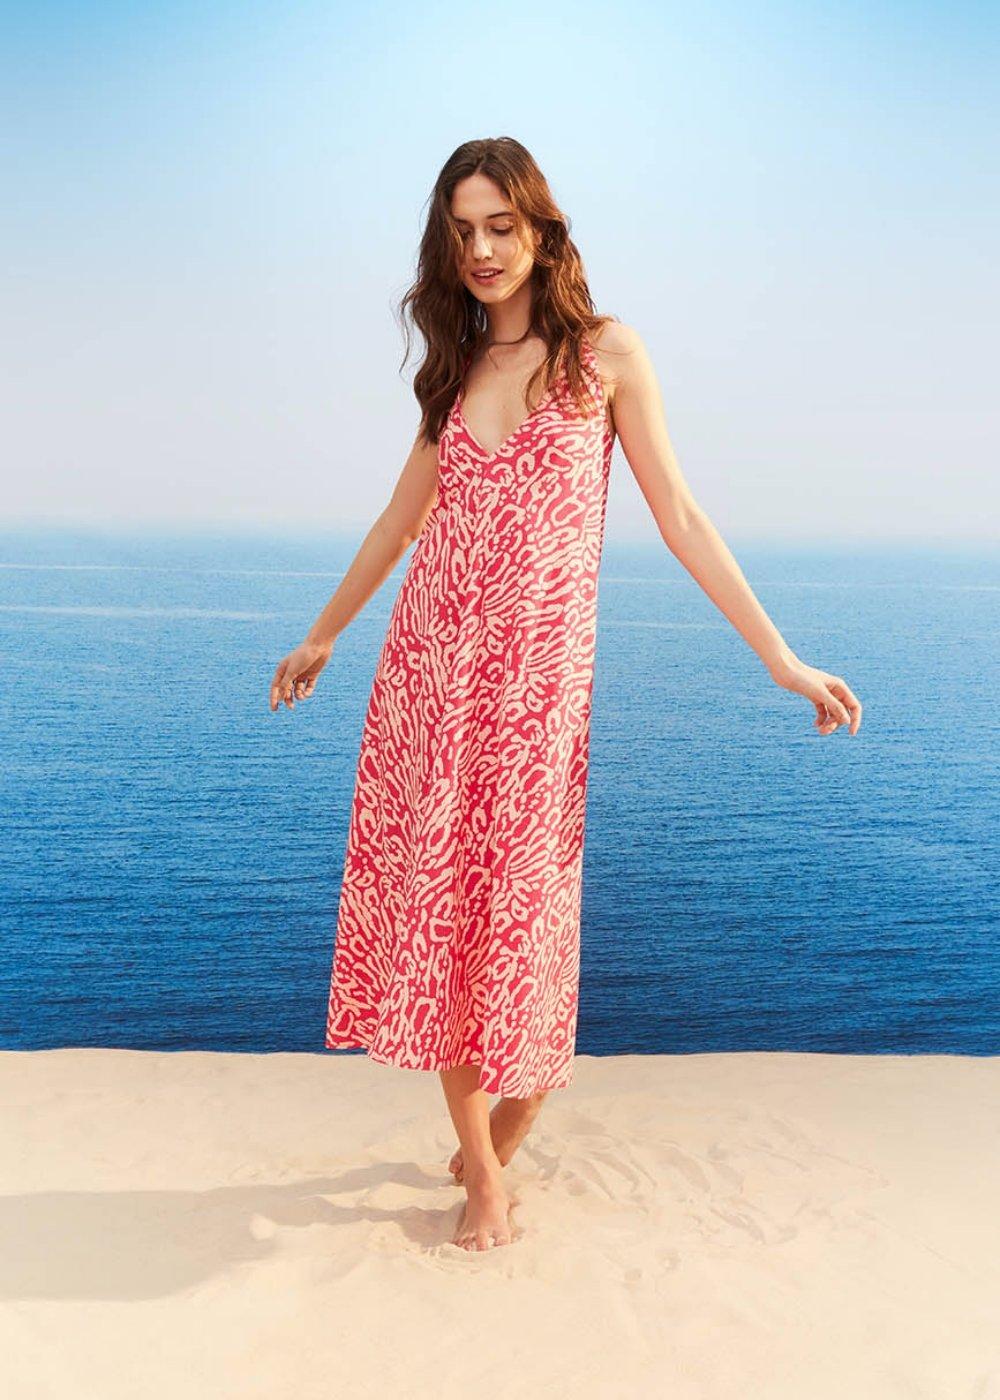 Alonso animal print dress - Gloss \ Sepia \ Animalier - Woman